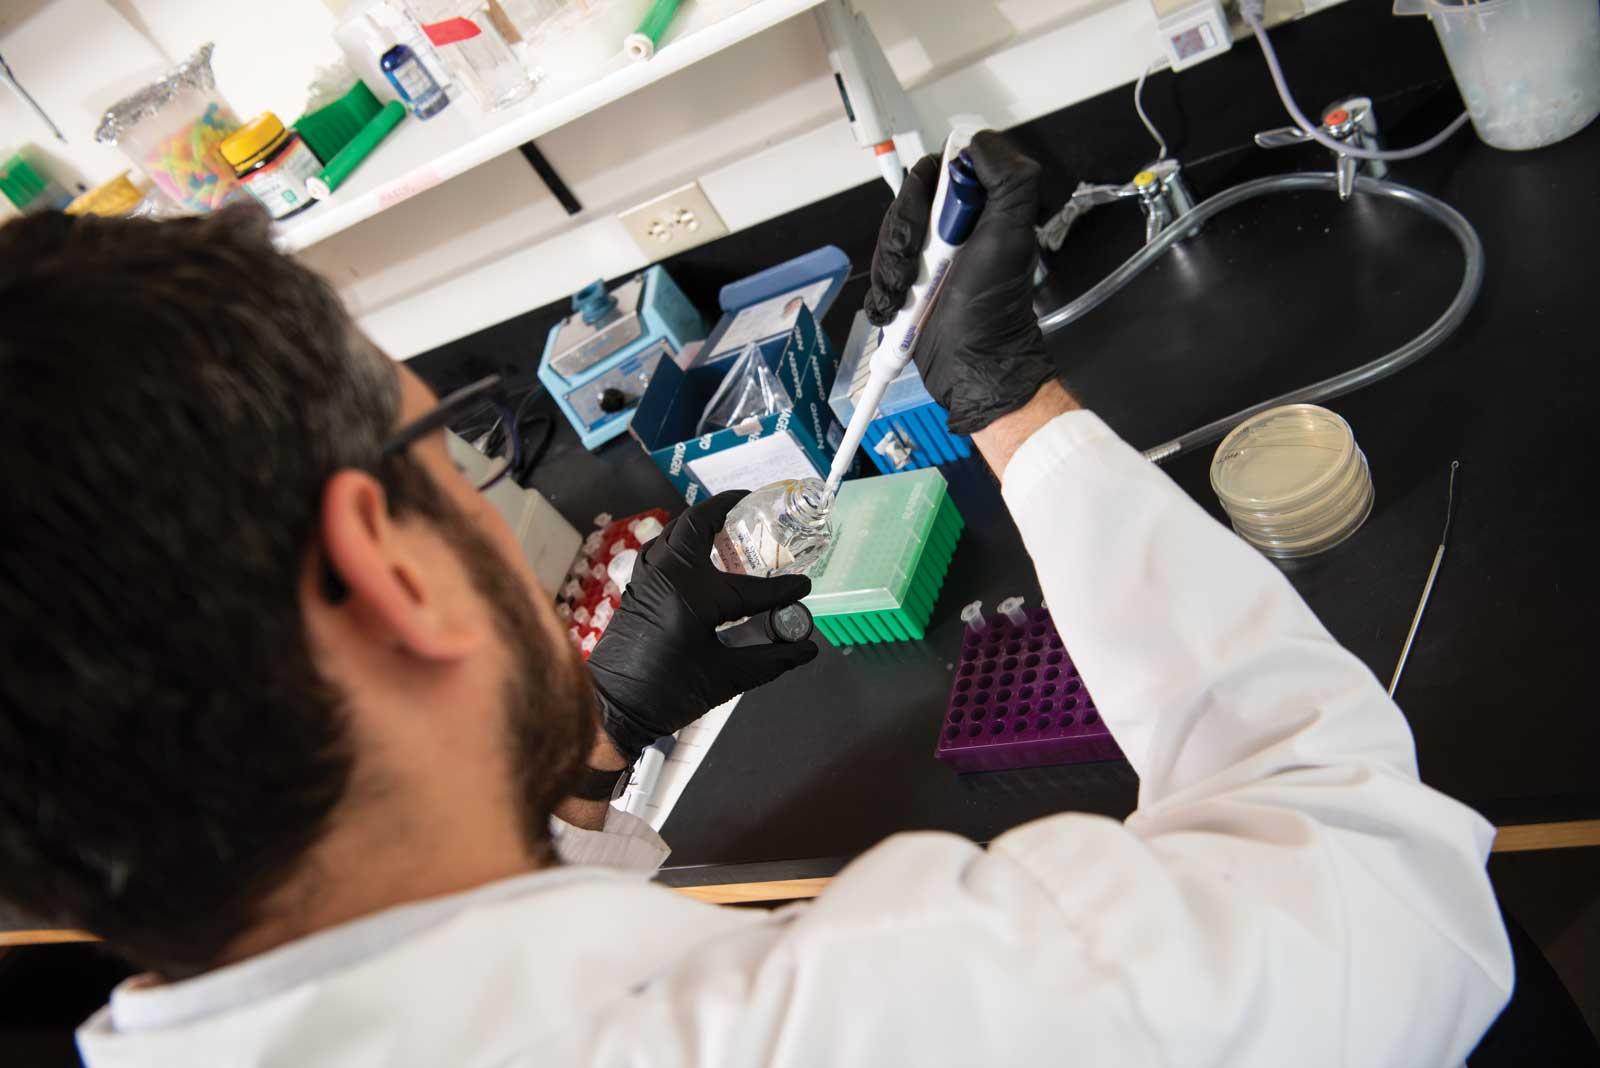 Photo: Monteiro working in the lab